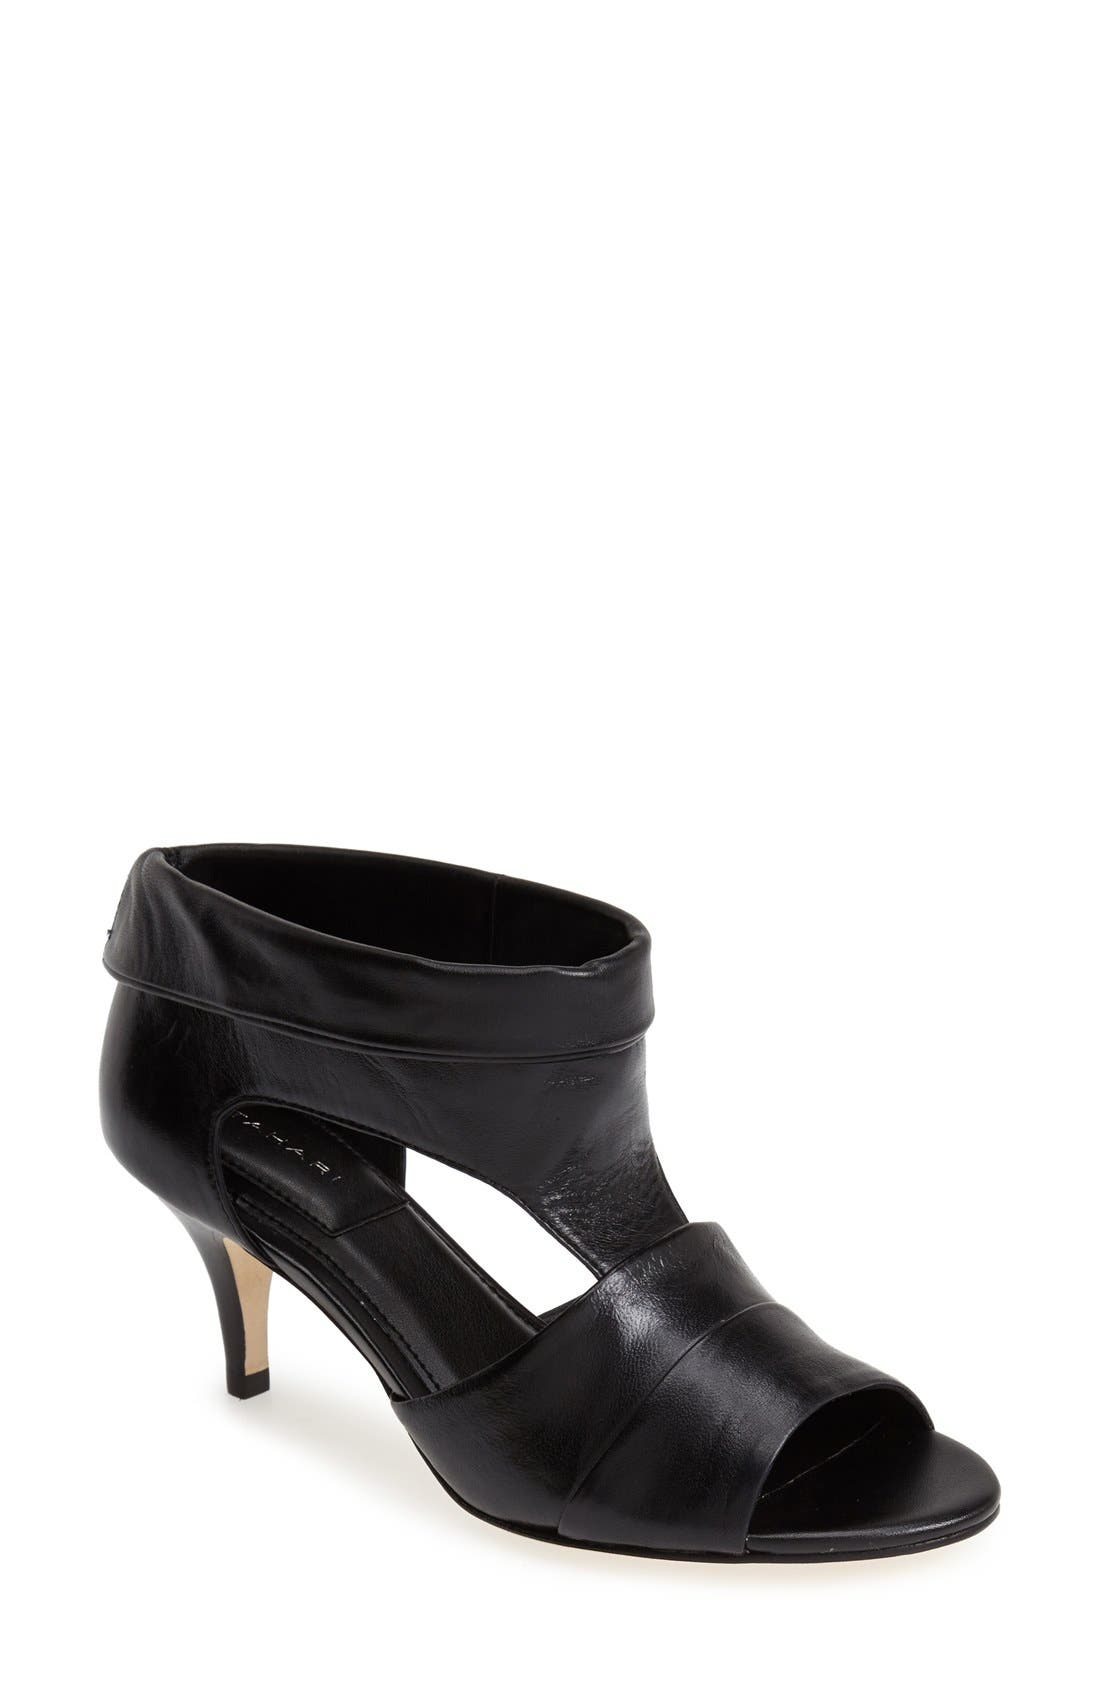 Alternate Image 1 Selected - T Tahari 'Rumer' Cuff Leather Bootie (Women)